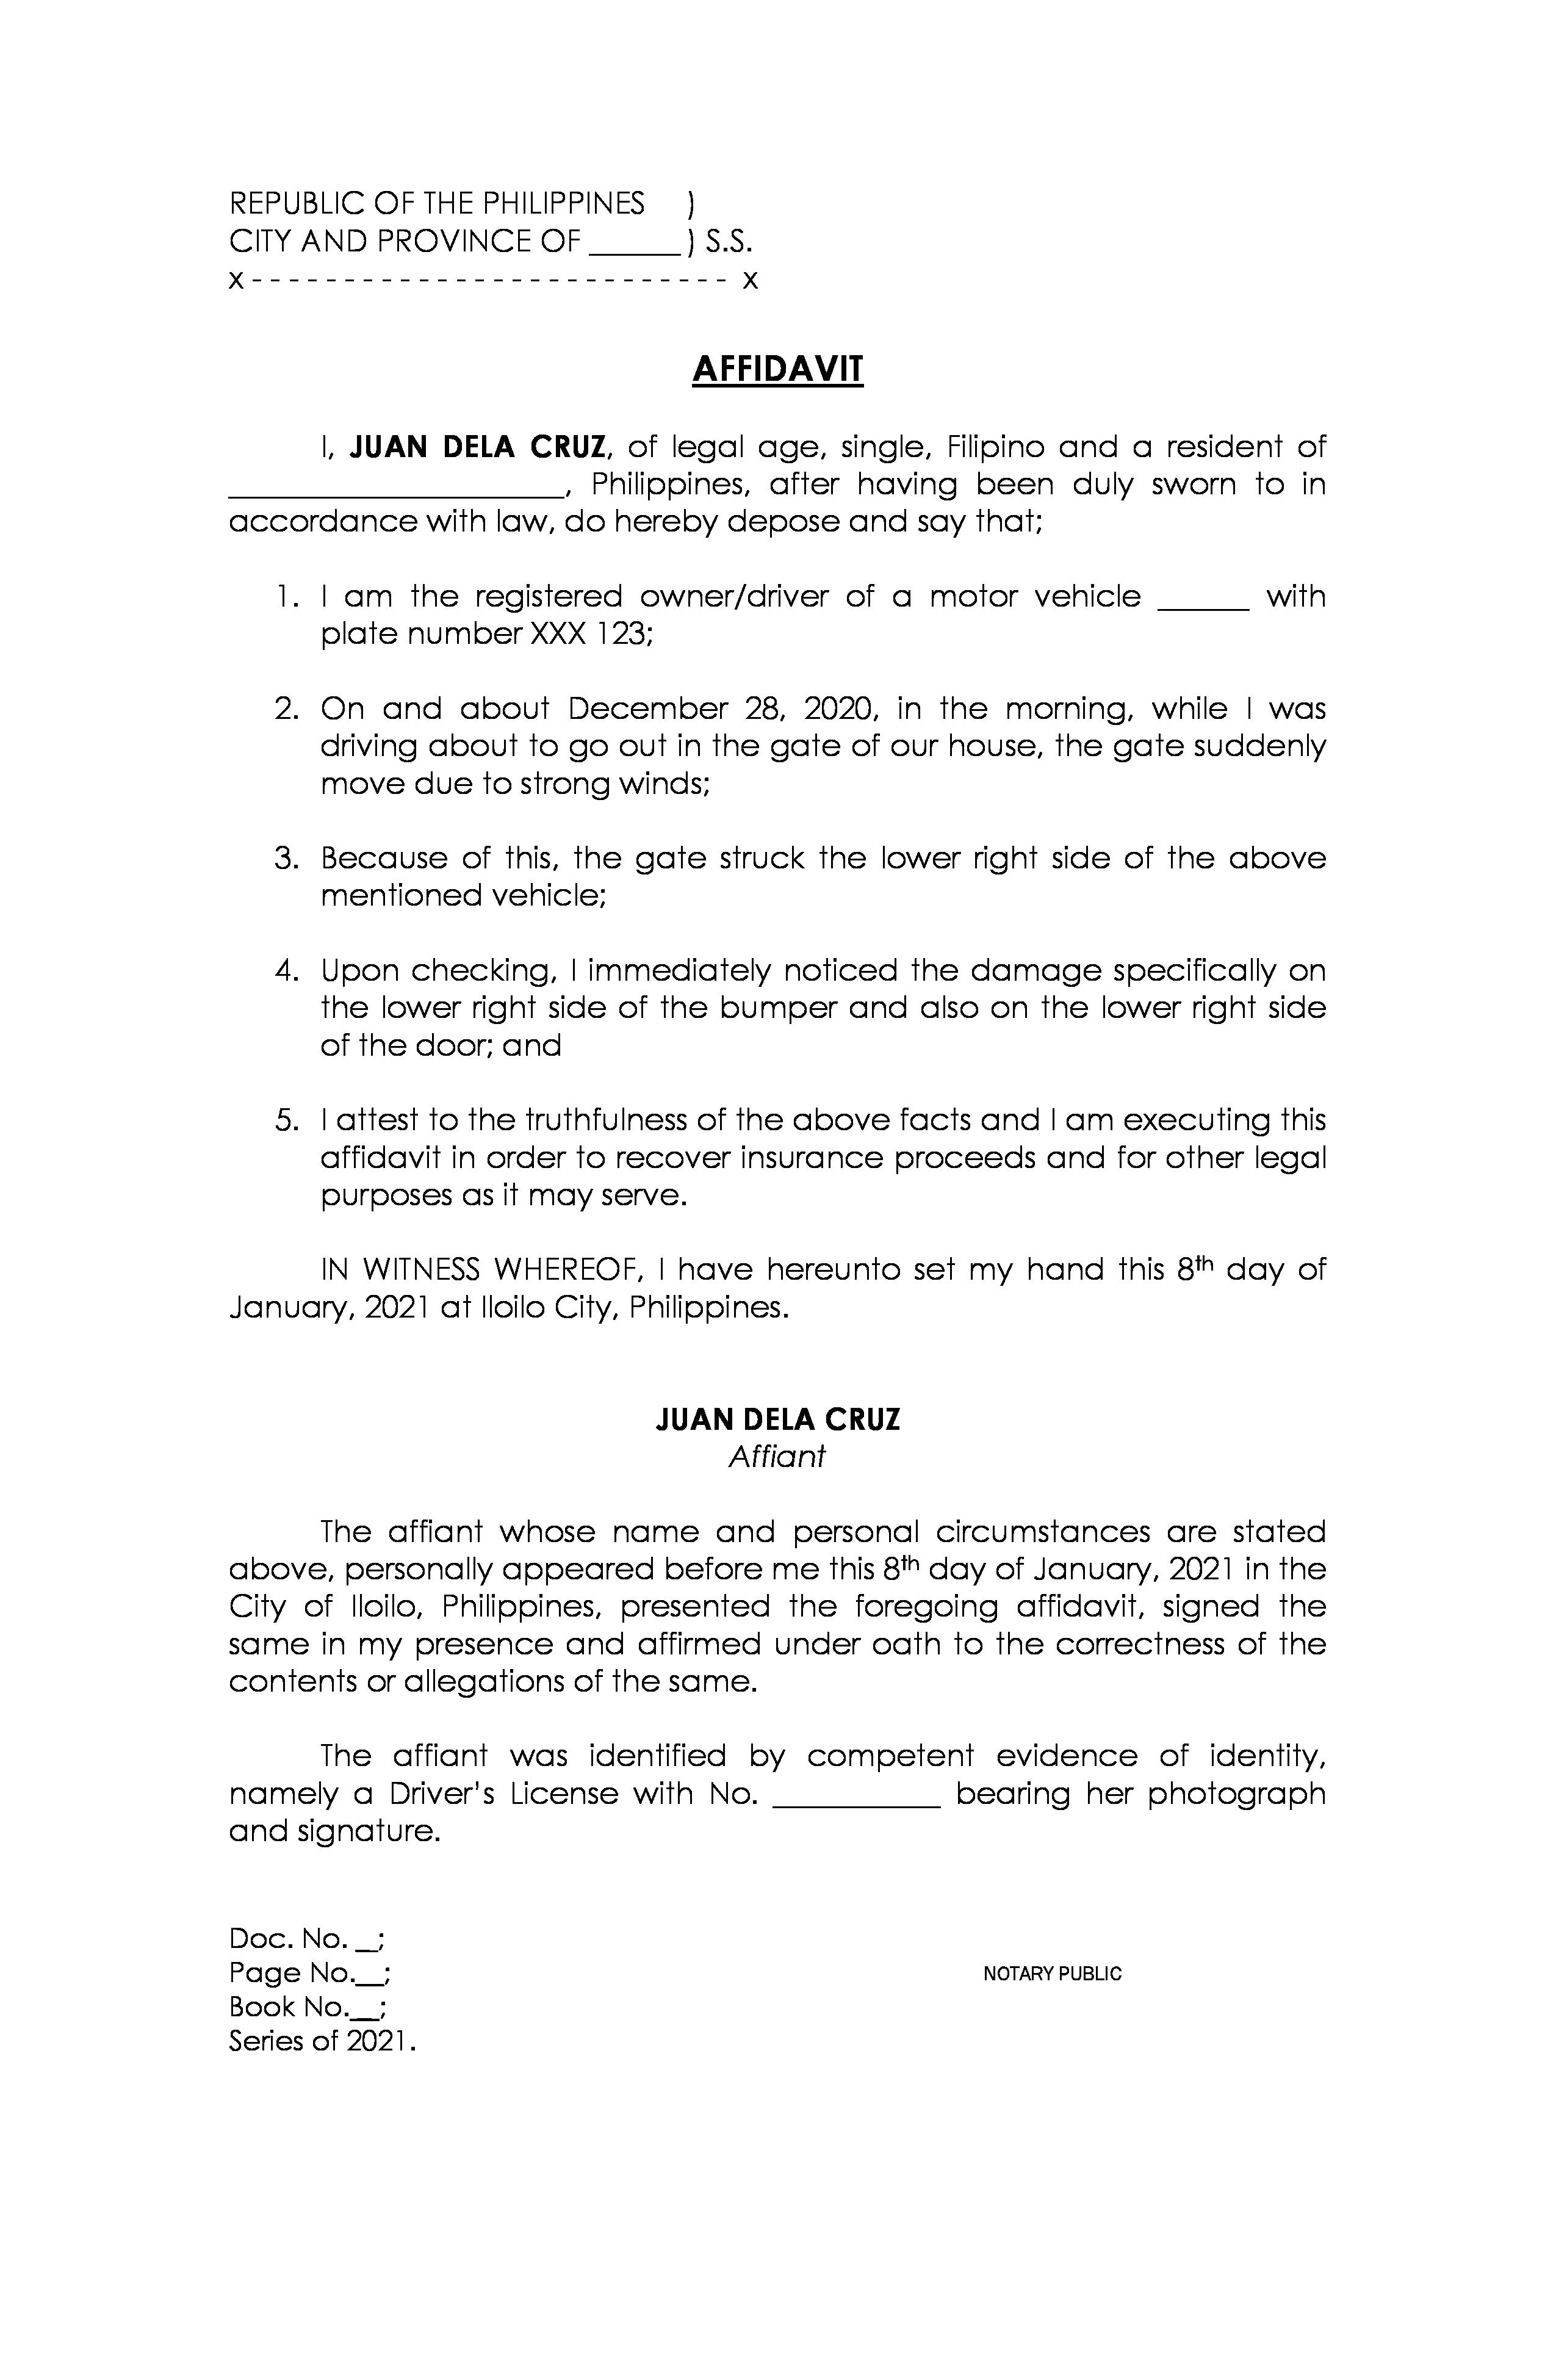 Affidavit of Own Damage sample